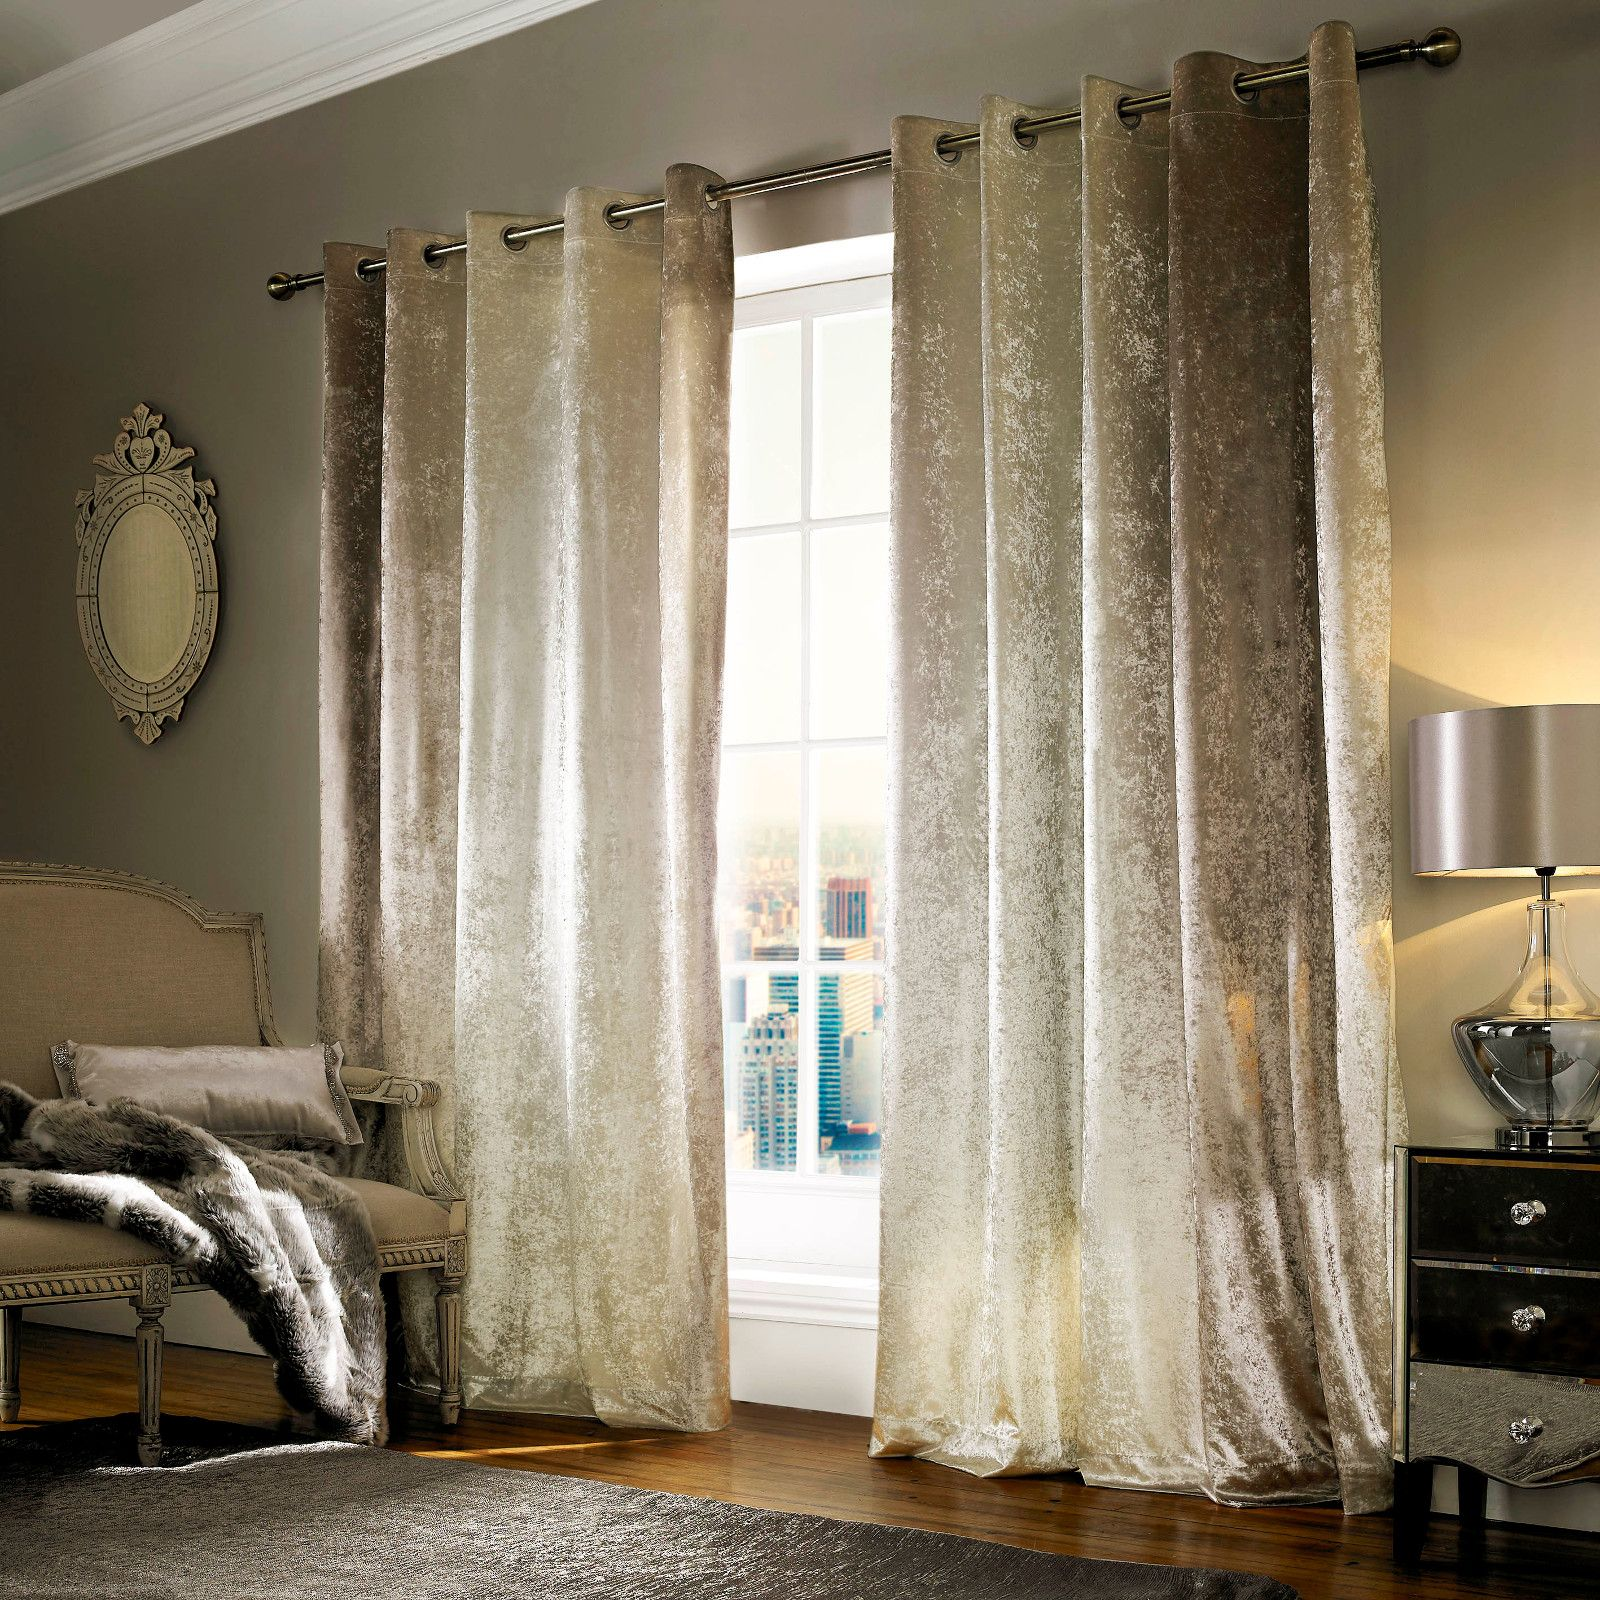 Kylie minogue natala champagne curtains kylie minogue at home beautiful curtains home curtains